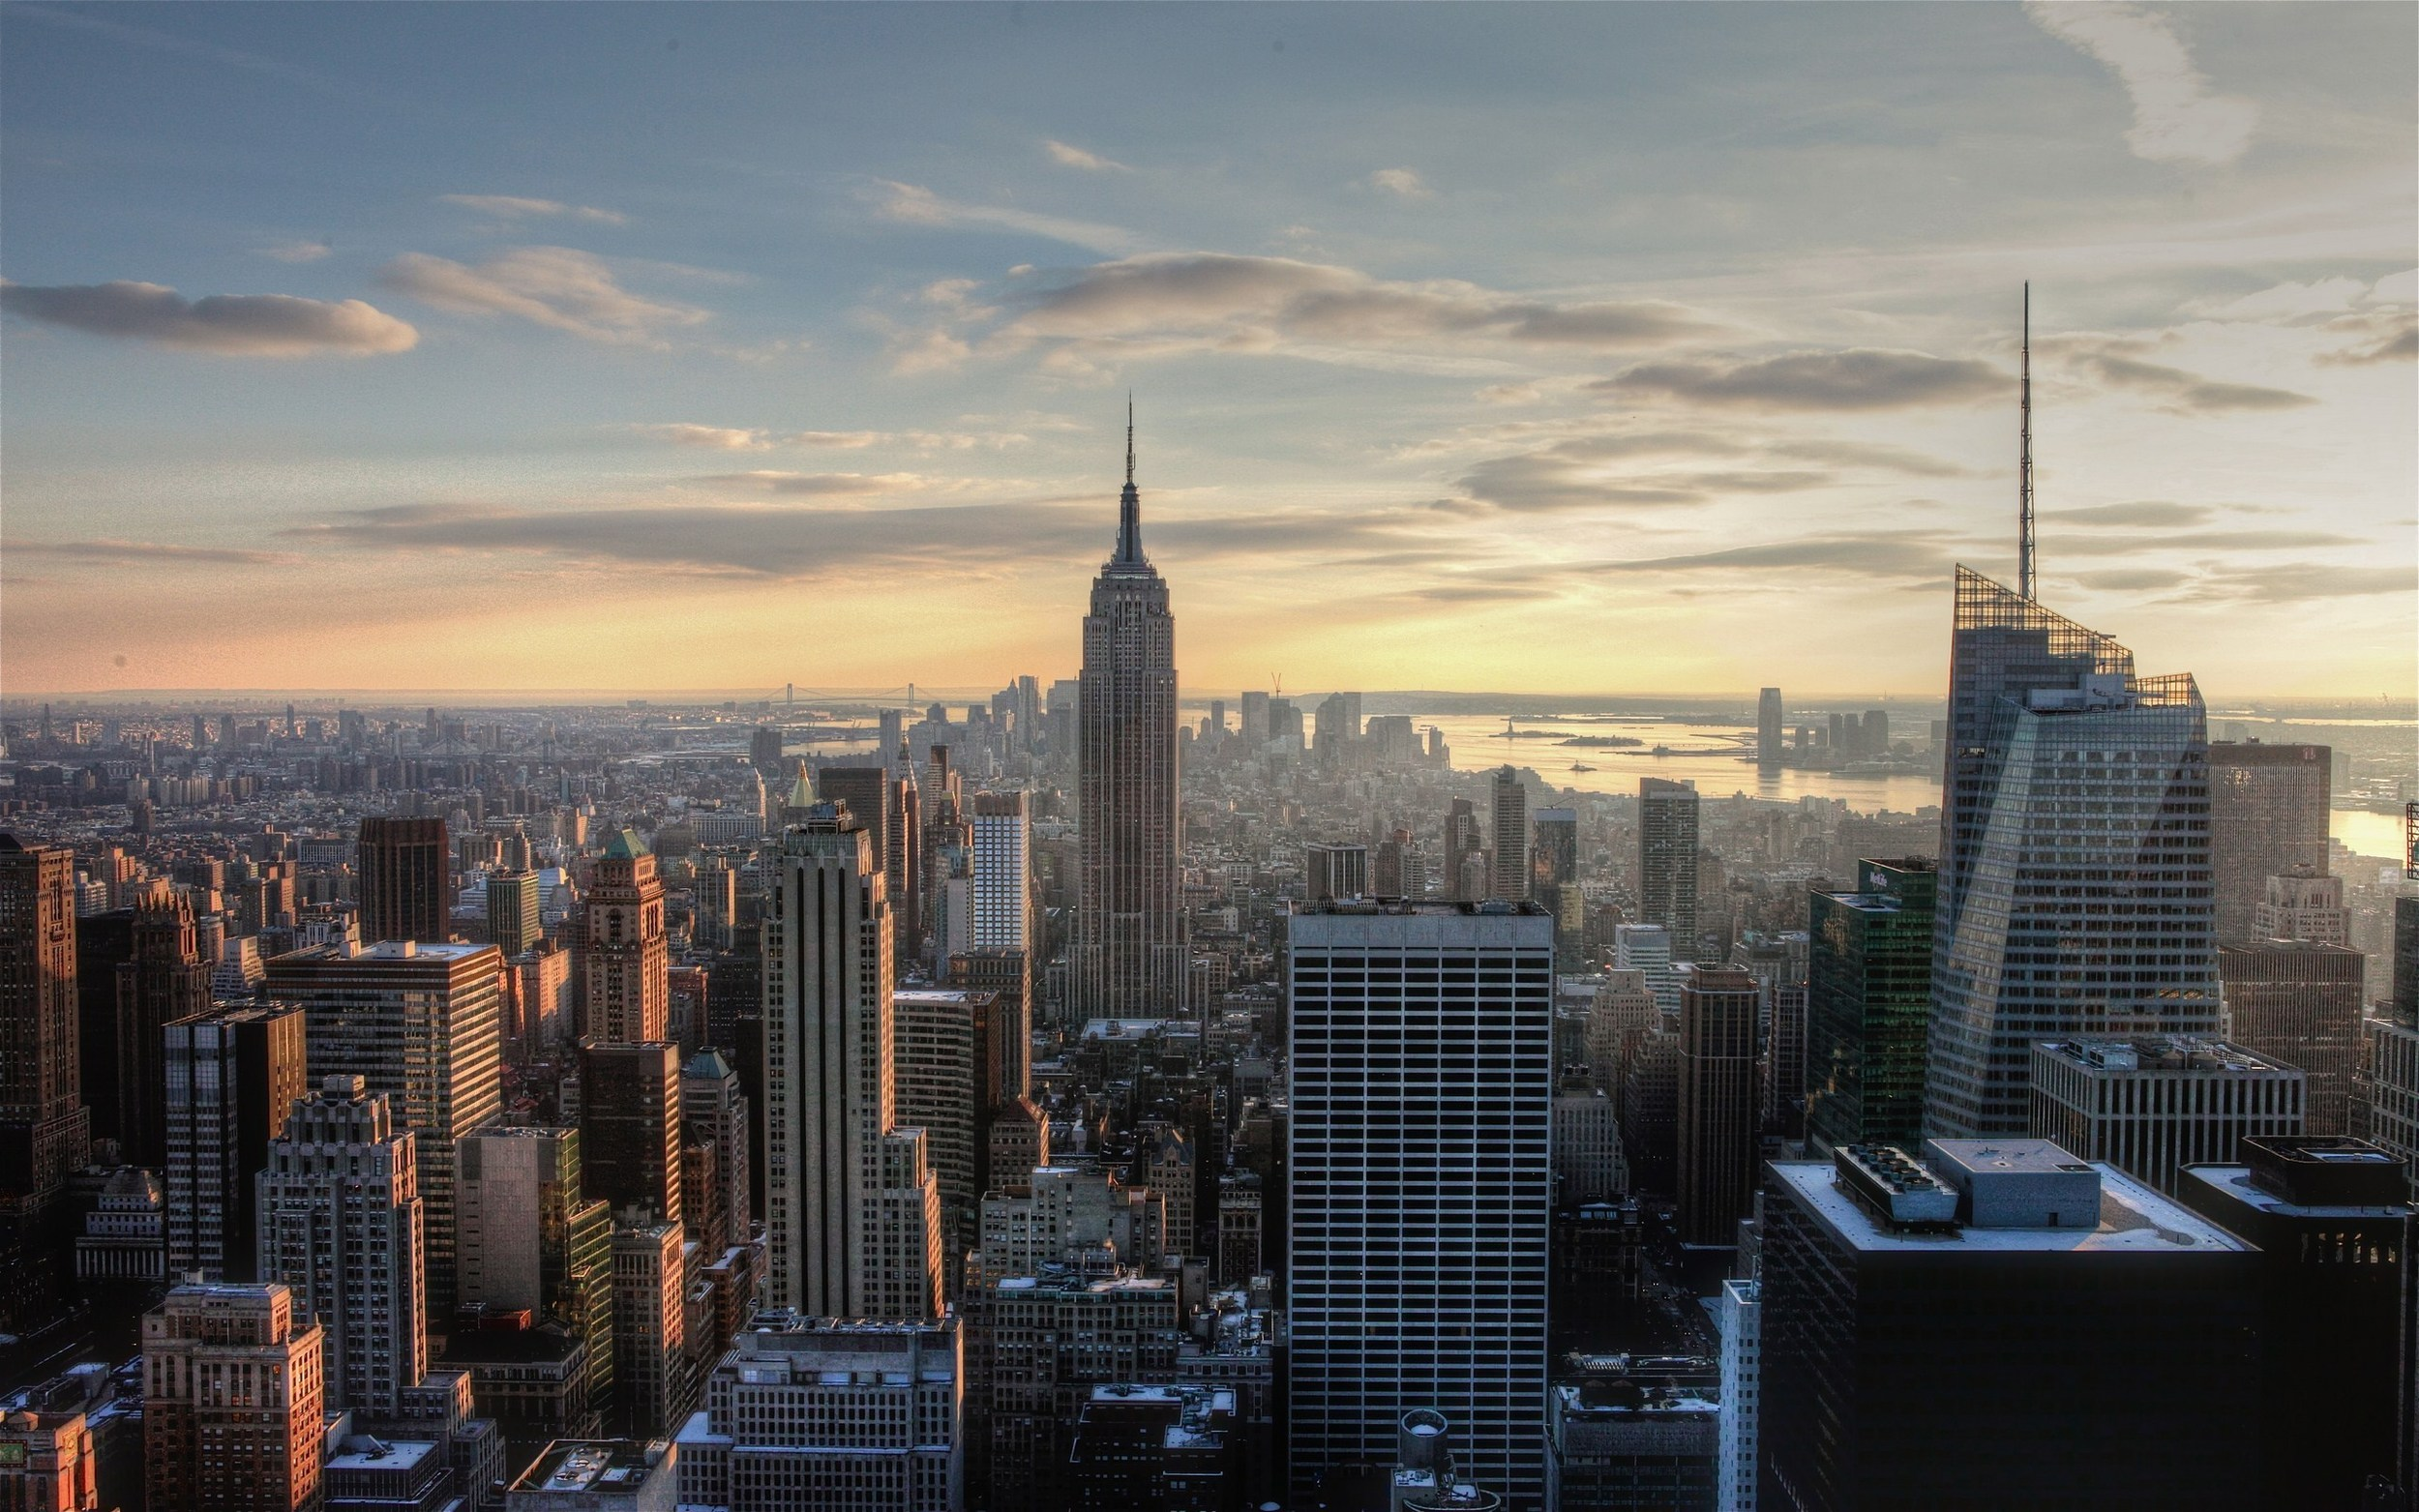 New-York-Wallpaper-2560x1600-03.jpg